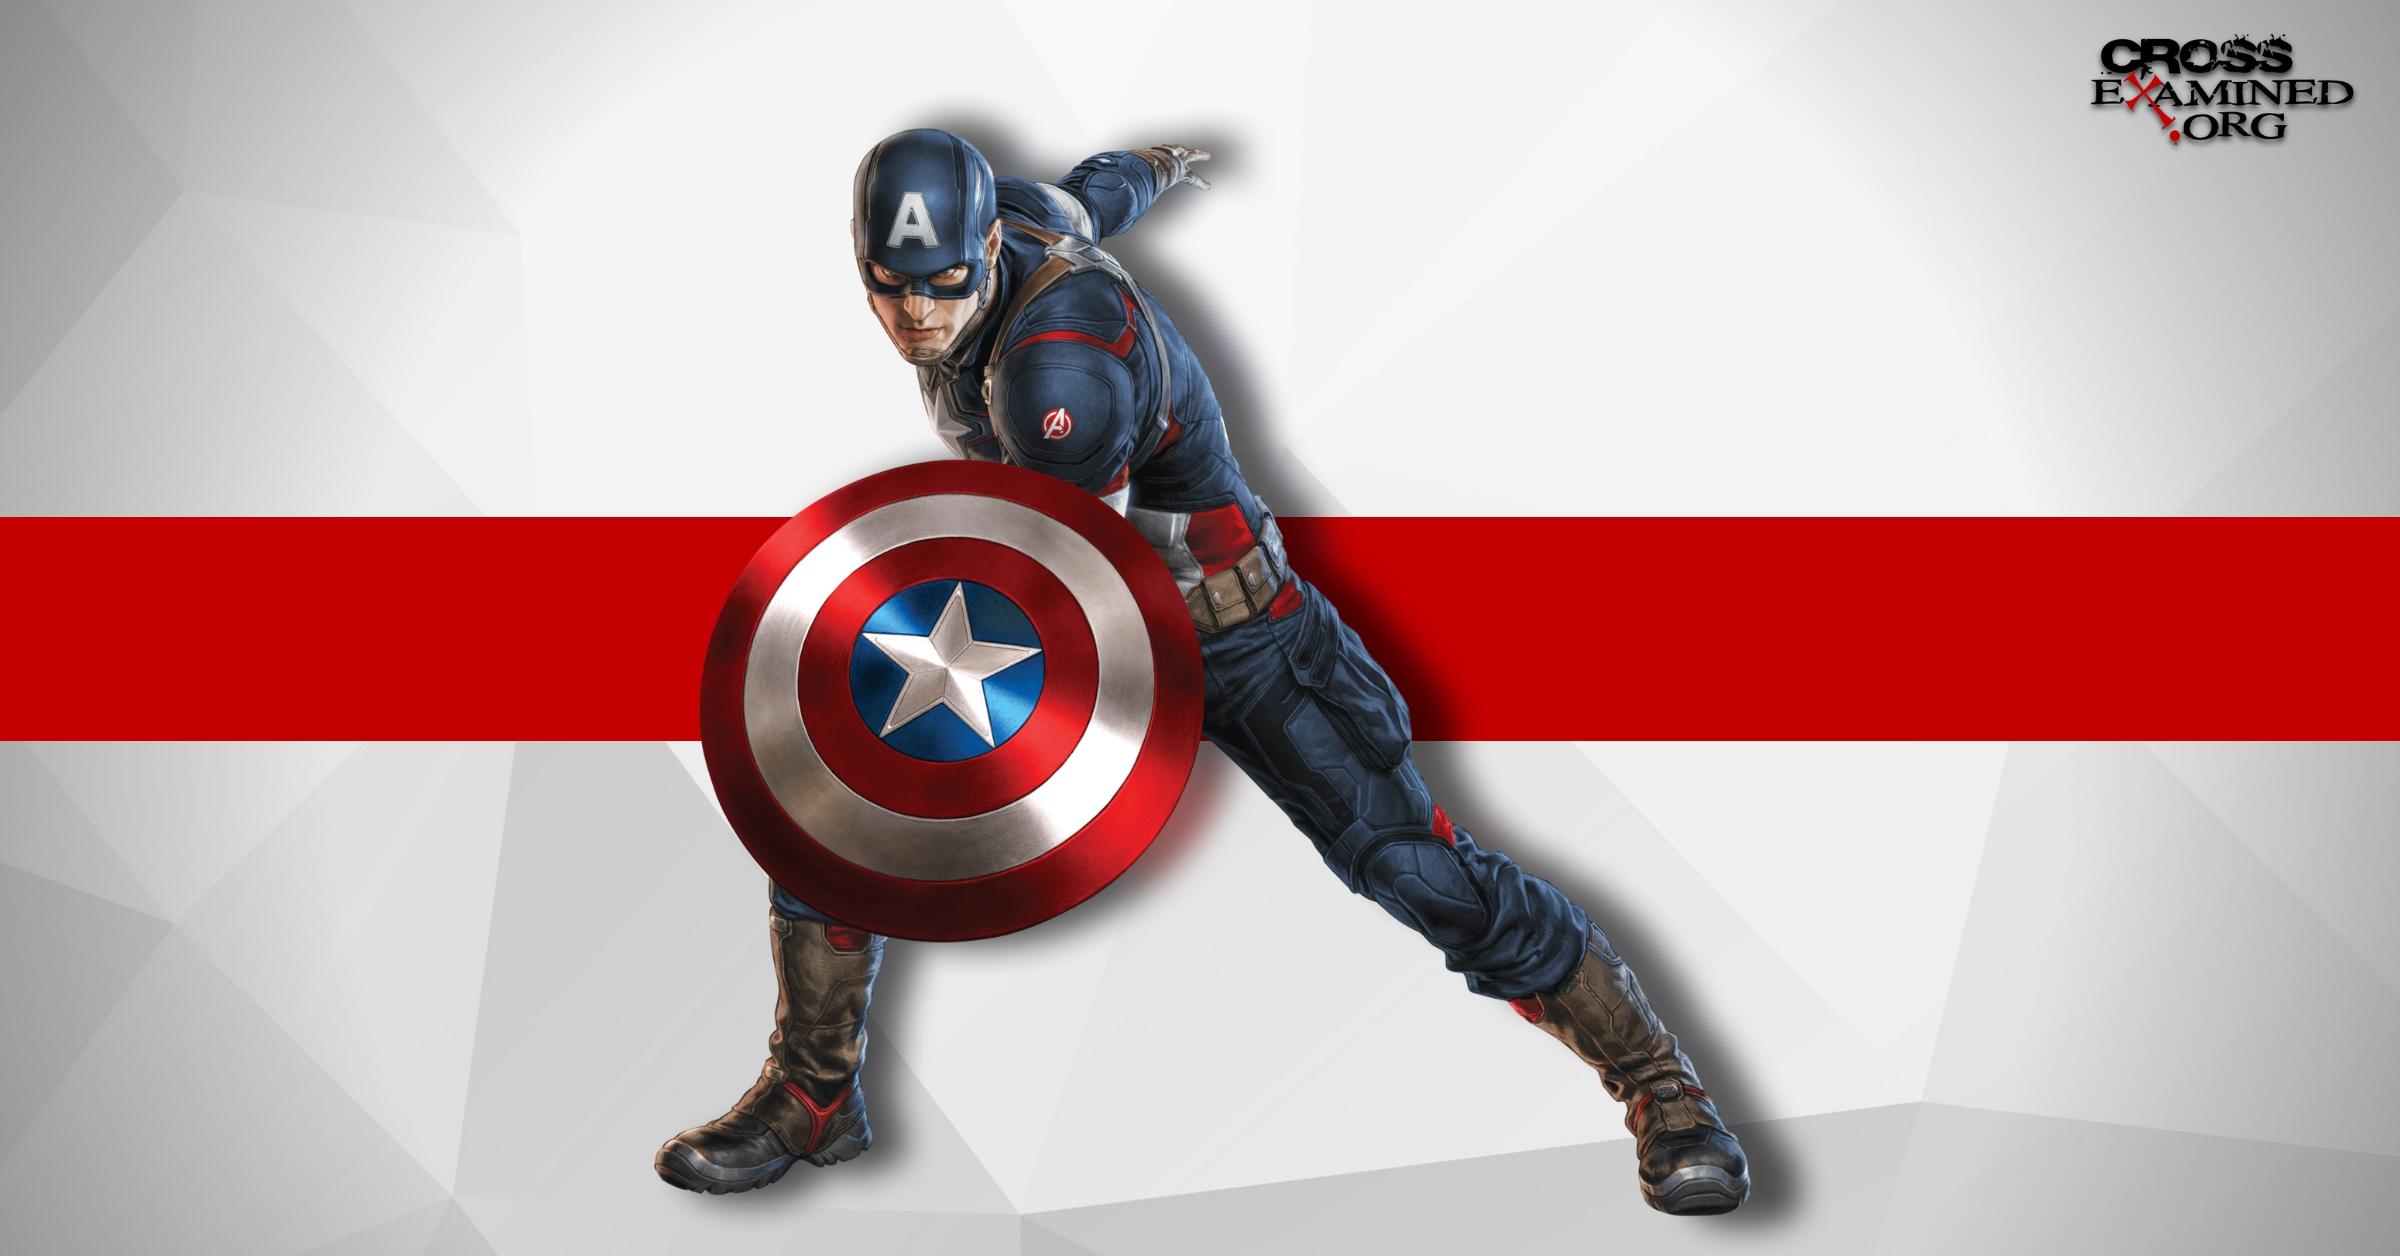 Captain America & the Moral Argument